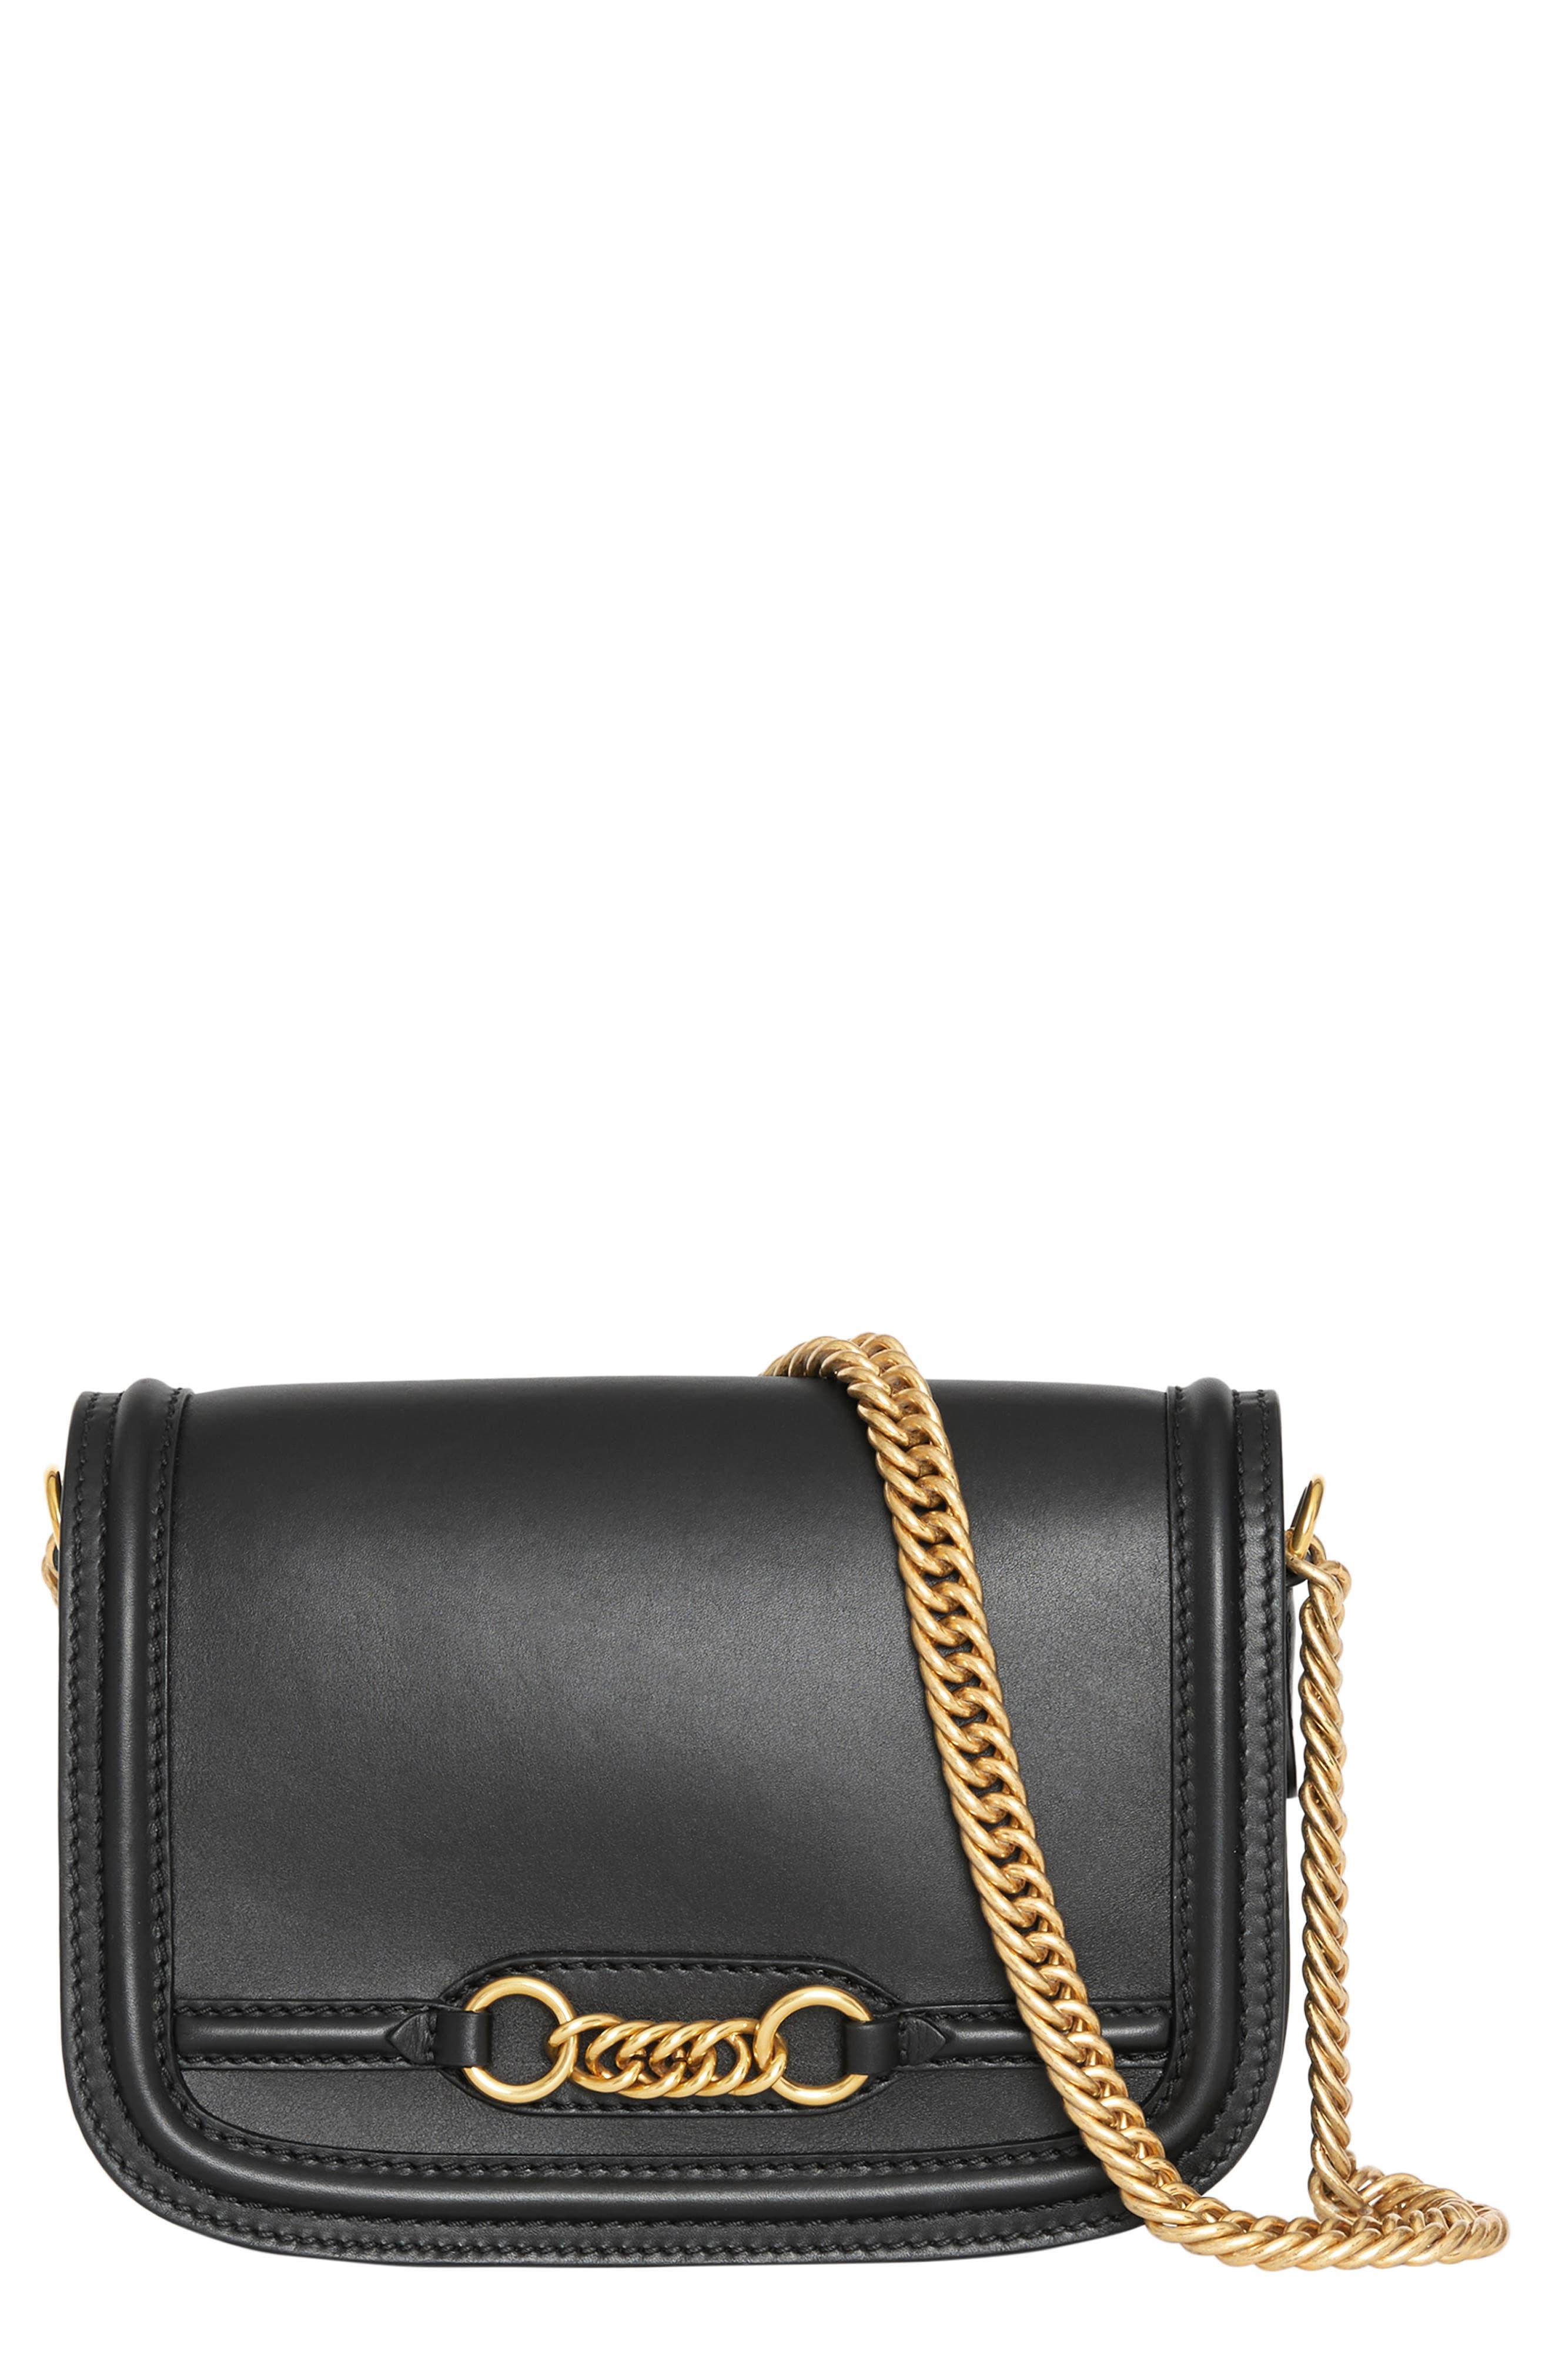 Link Flap Leather Crossbody Bag,                             Main thumbnail 1, color,                             BLACK